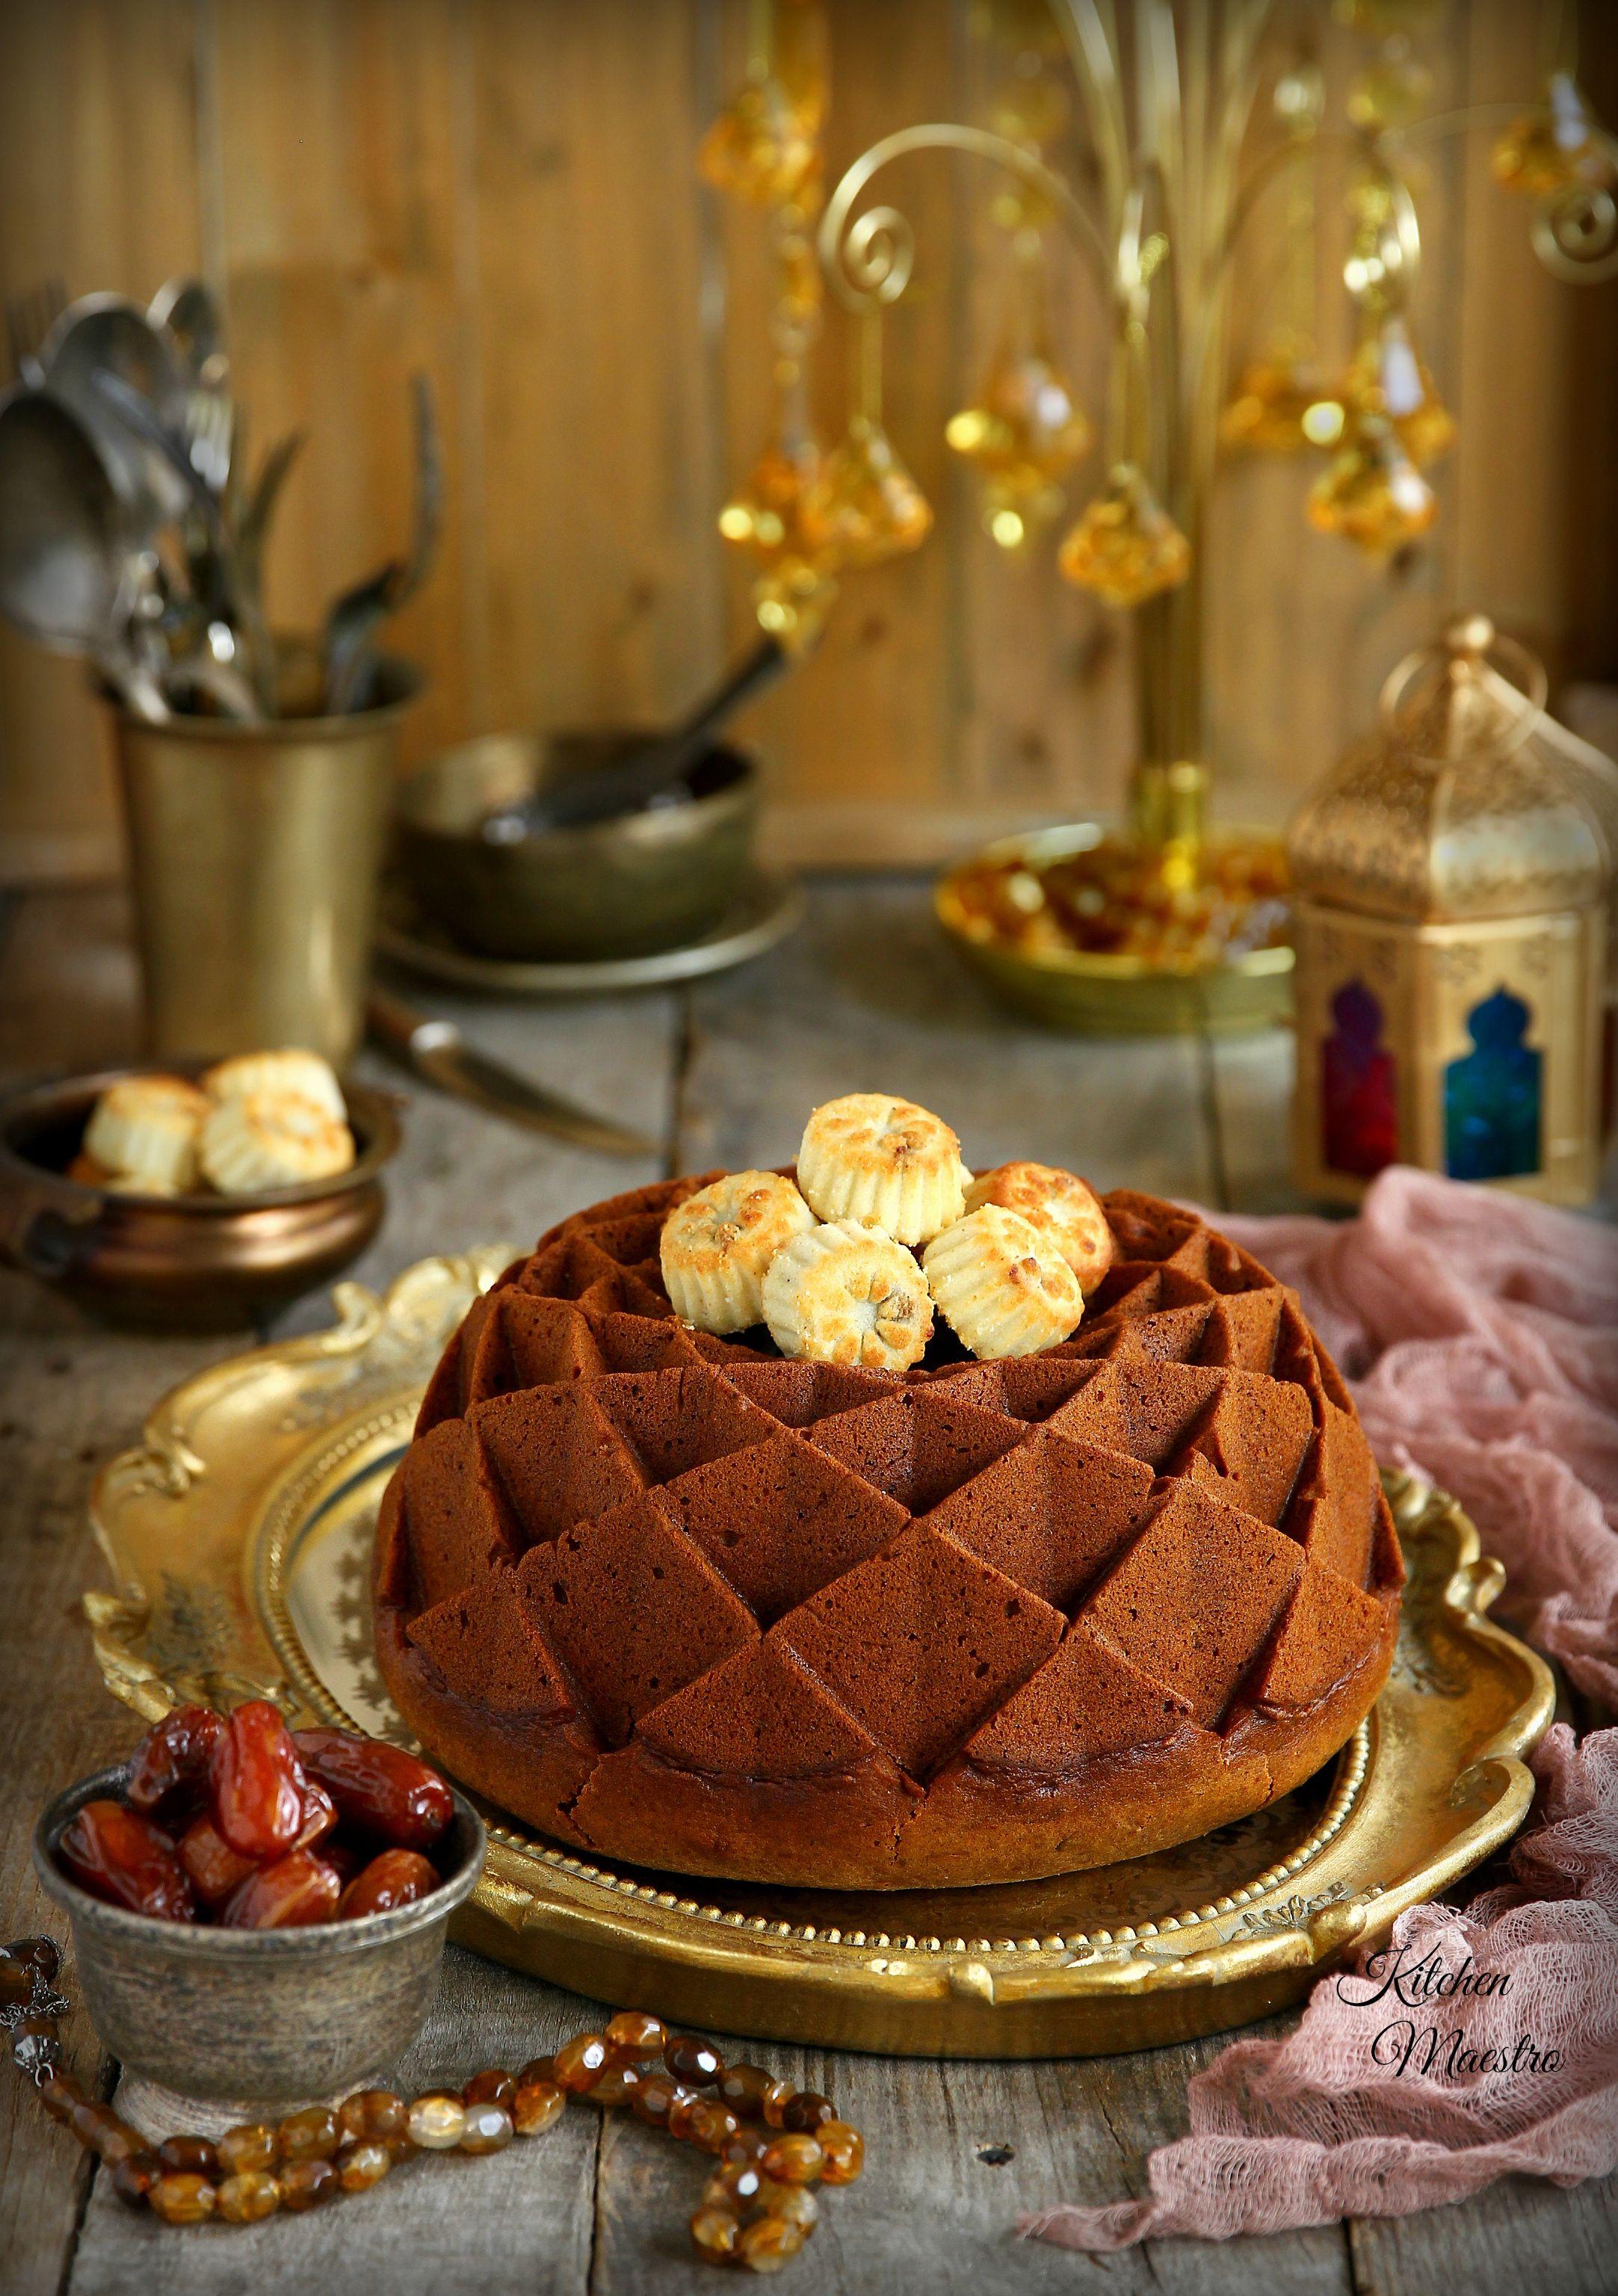 Date Cake كيكة التمر Middle Eastern Desserts Date Cake Cake